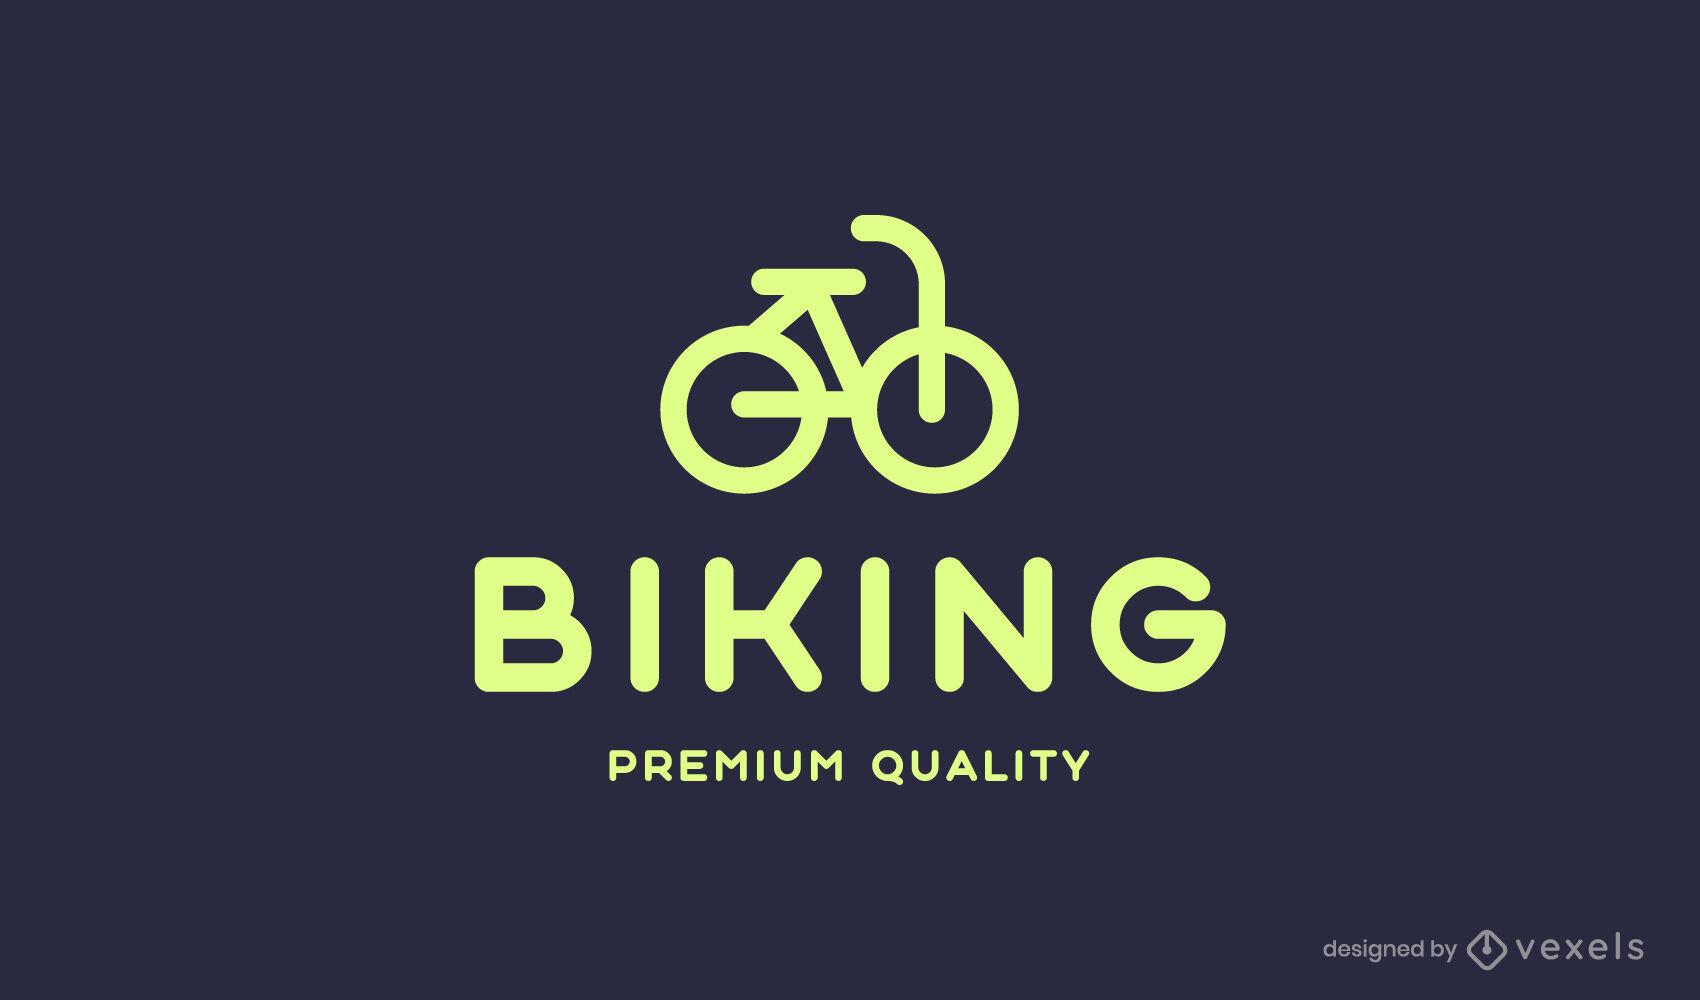 Geometric bycicle logo stroke